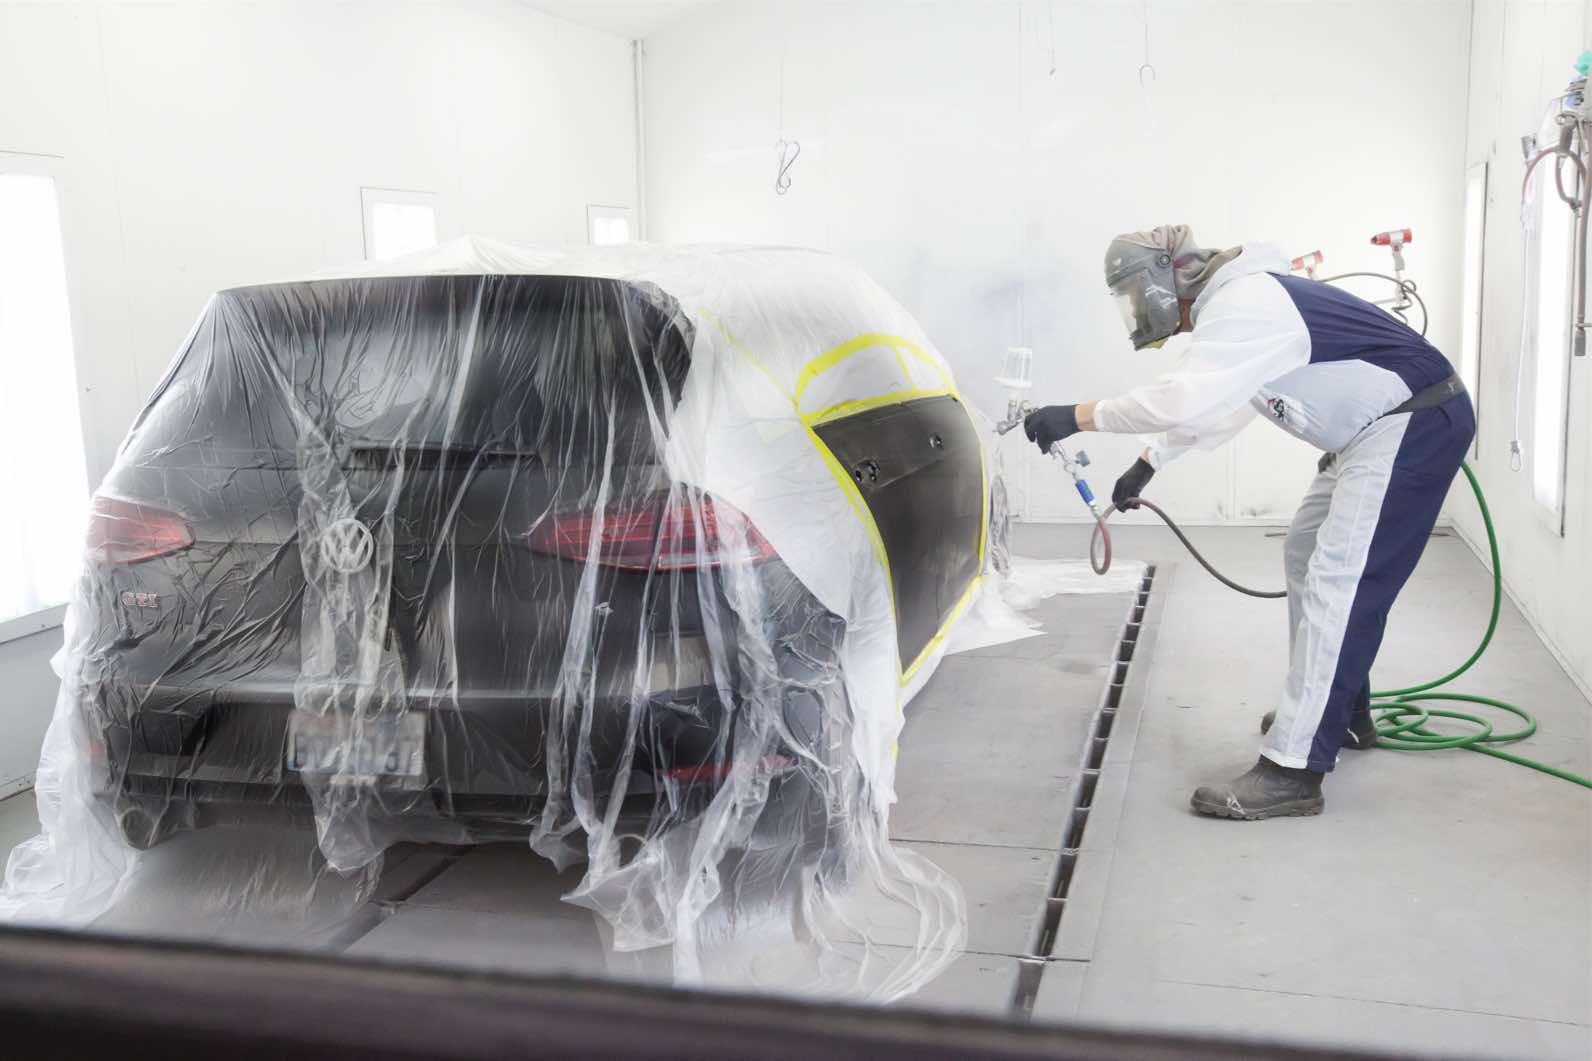 Jared McKay paints a Volkswagon hatchback